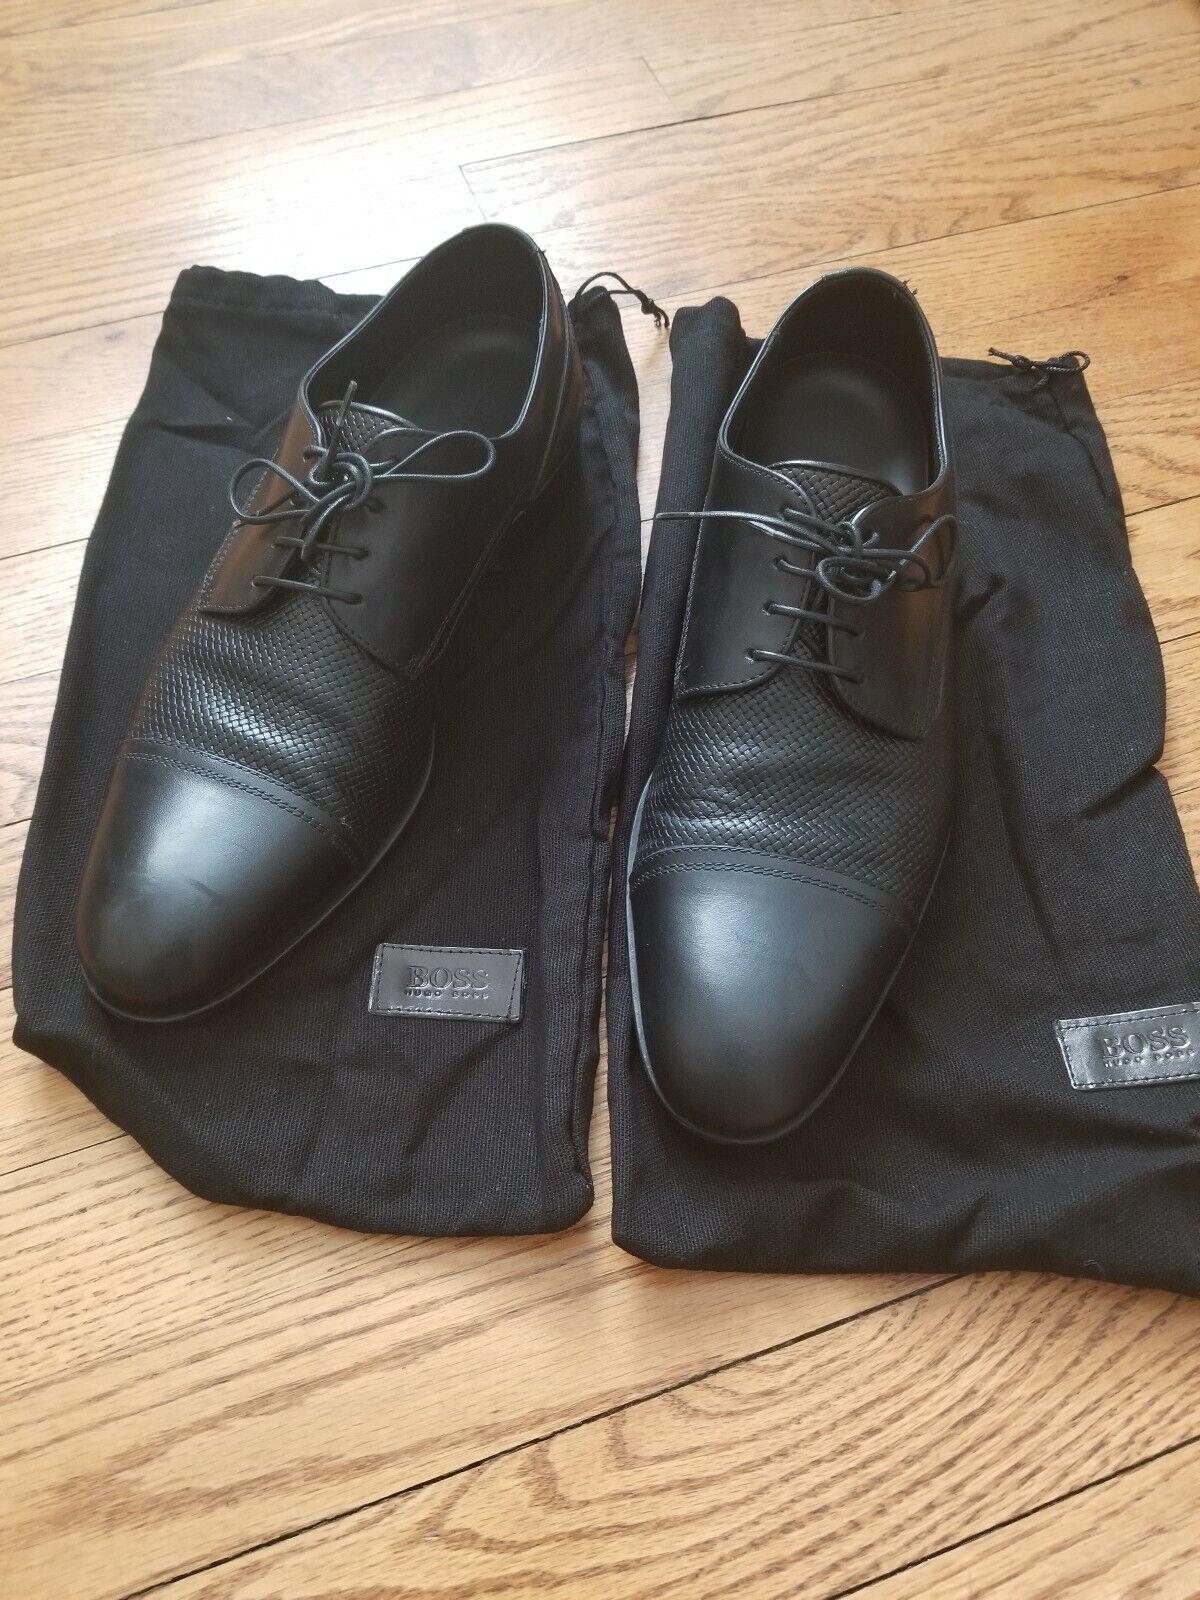 Zapatos De Vestir HUGO BOSS entiende Broders, EE. UU. 7.5 Negro